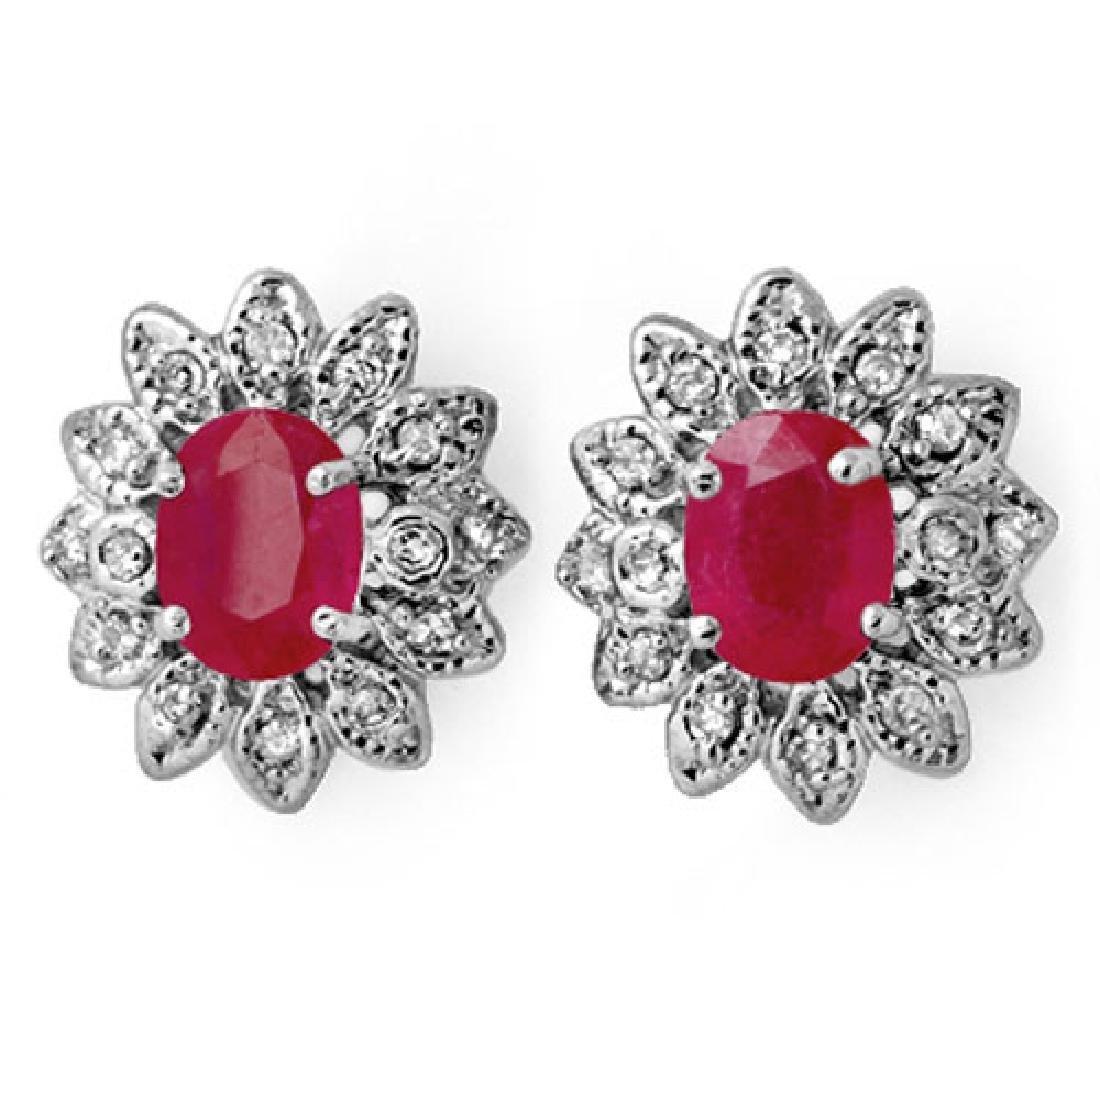 3.80 CTW Pink Sapphire & Diamond Earrings 14K White